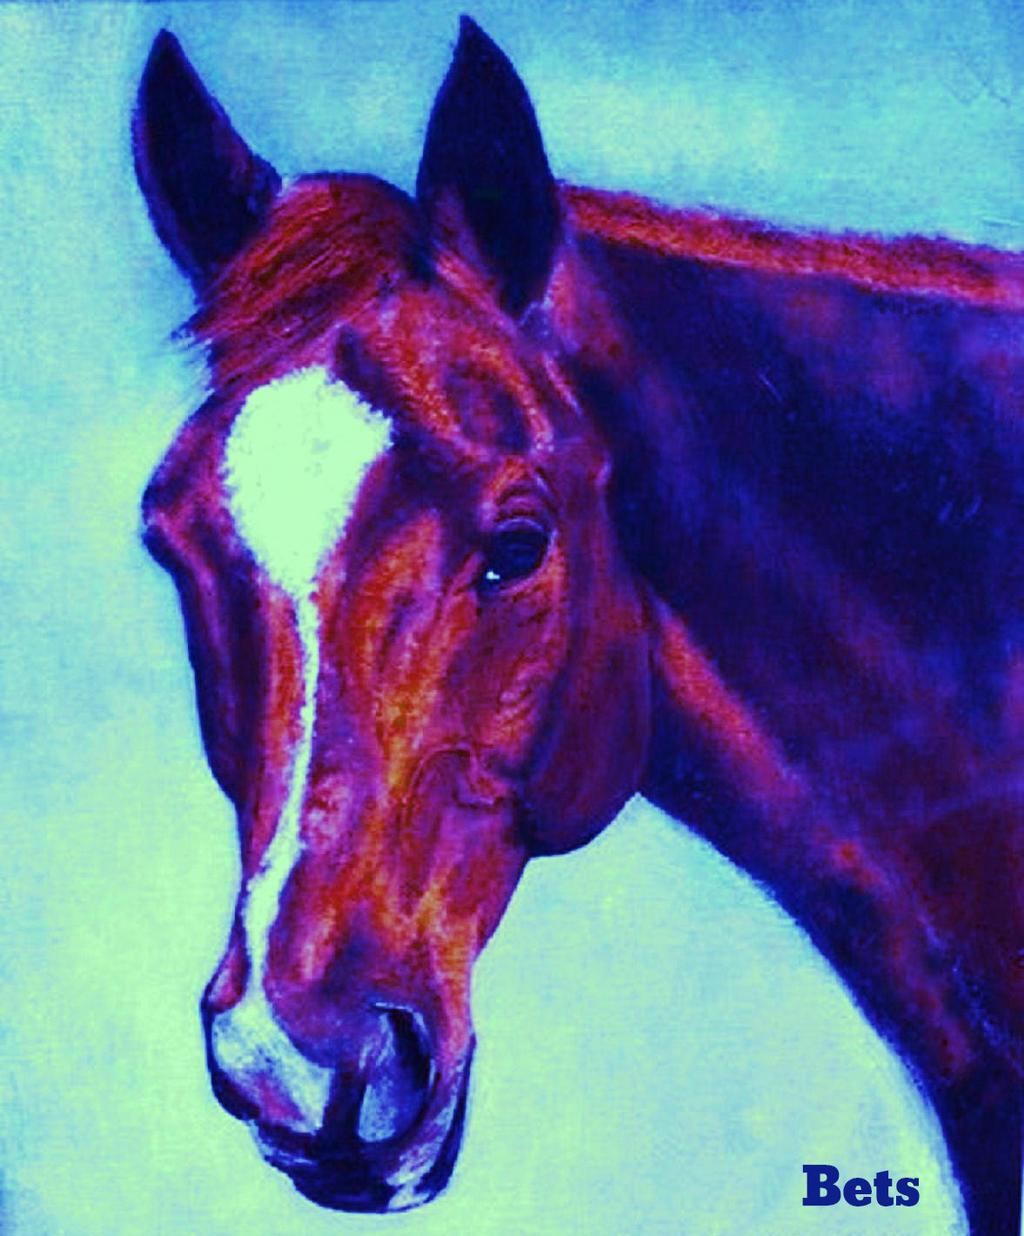 HORSE PRINT Giclee CHESTNUT Horse Horse Horse MADURO artist BETS 5 COLORS print Größe 15 X 18 444186